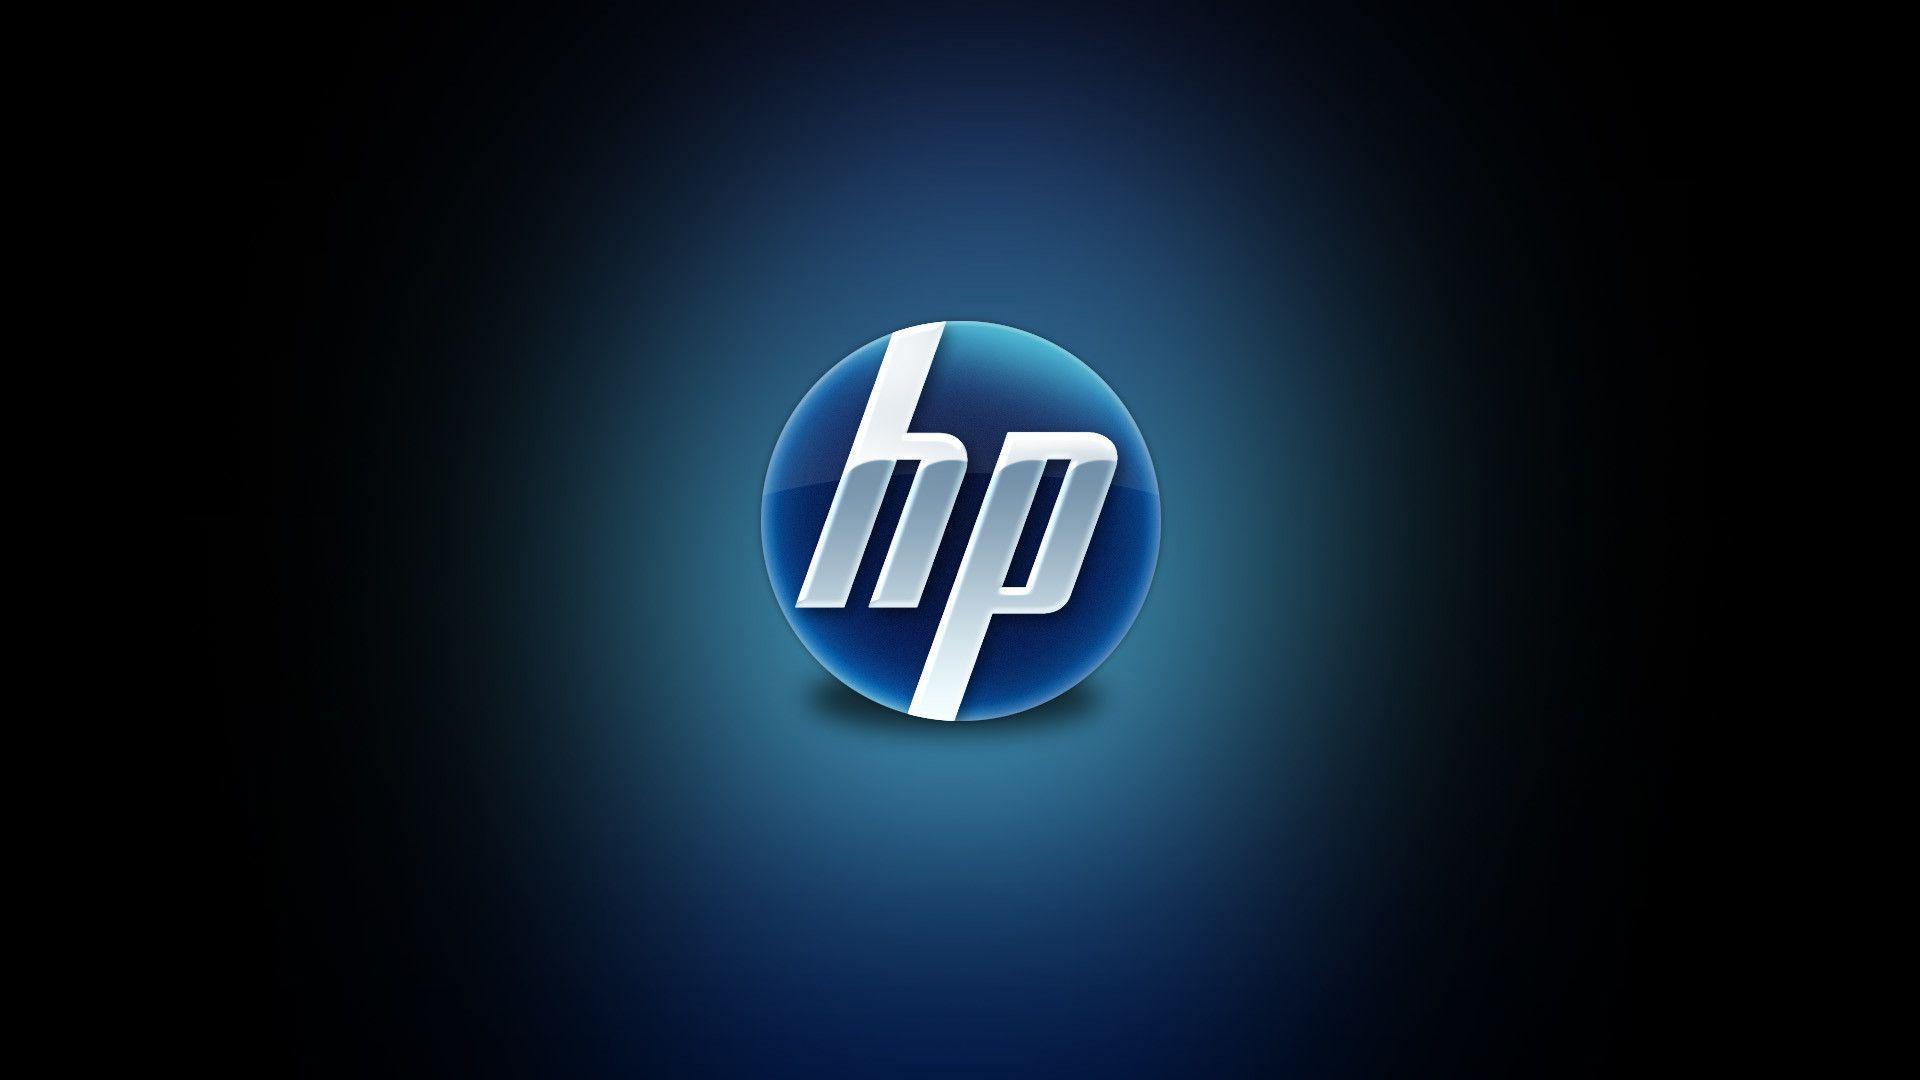 HP 4K Ultra HD Wallpapers - Top Free HP 4K Ultra HD ...